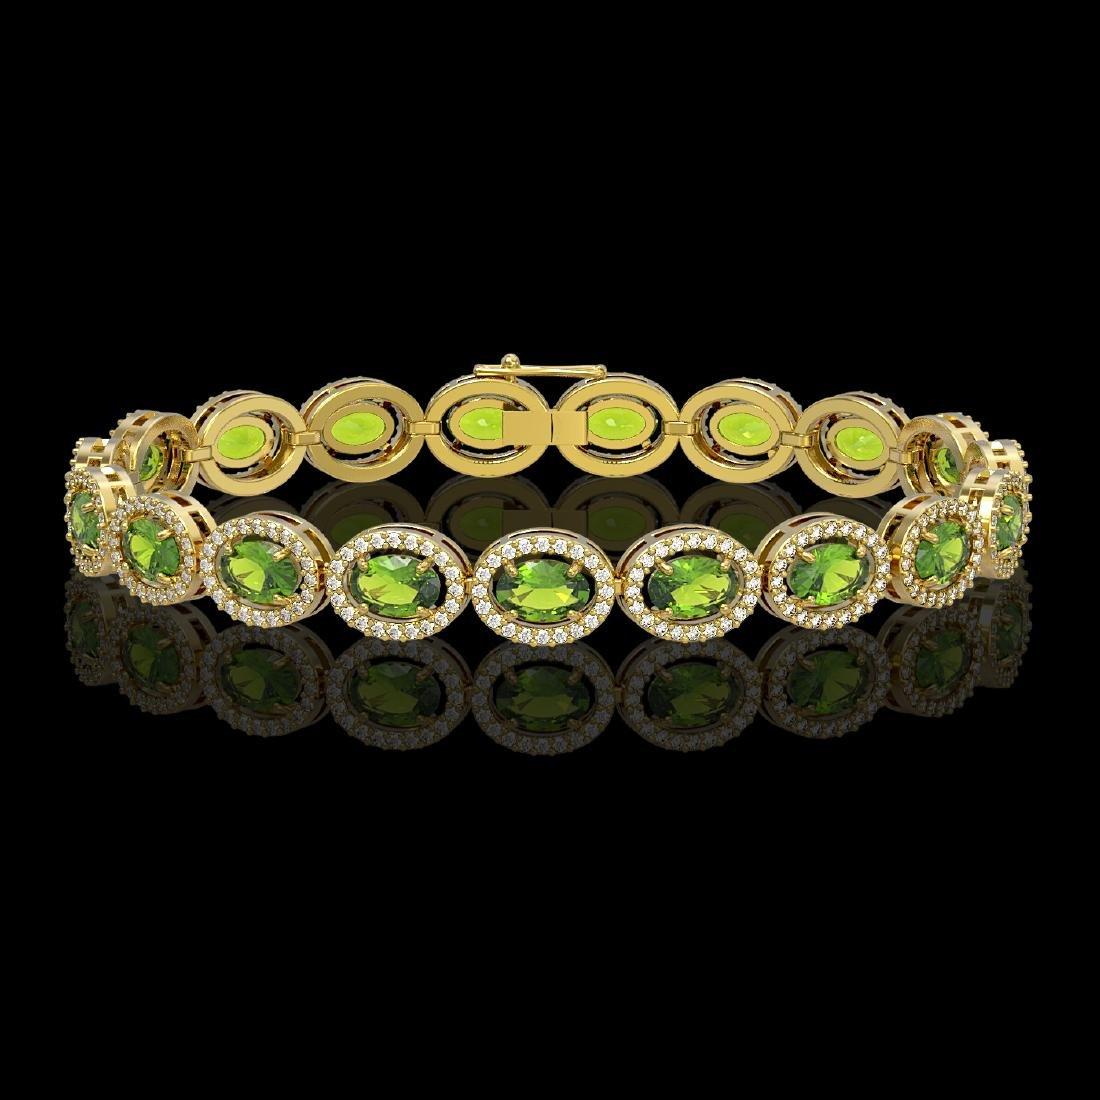 13.87 CTW Peridot & Diamond Halo Bracelet 10K Yellow